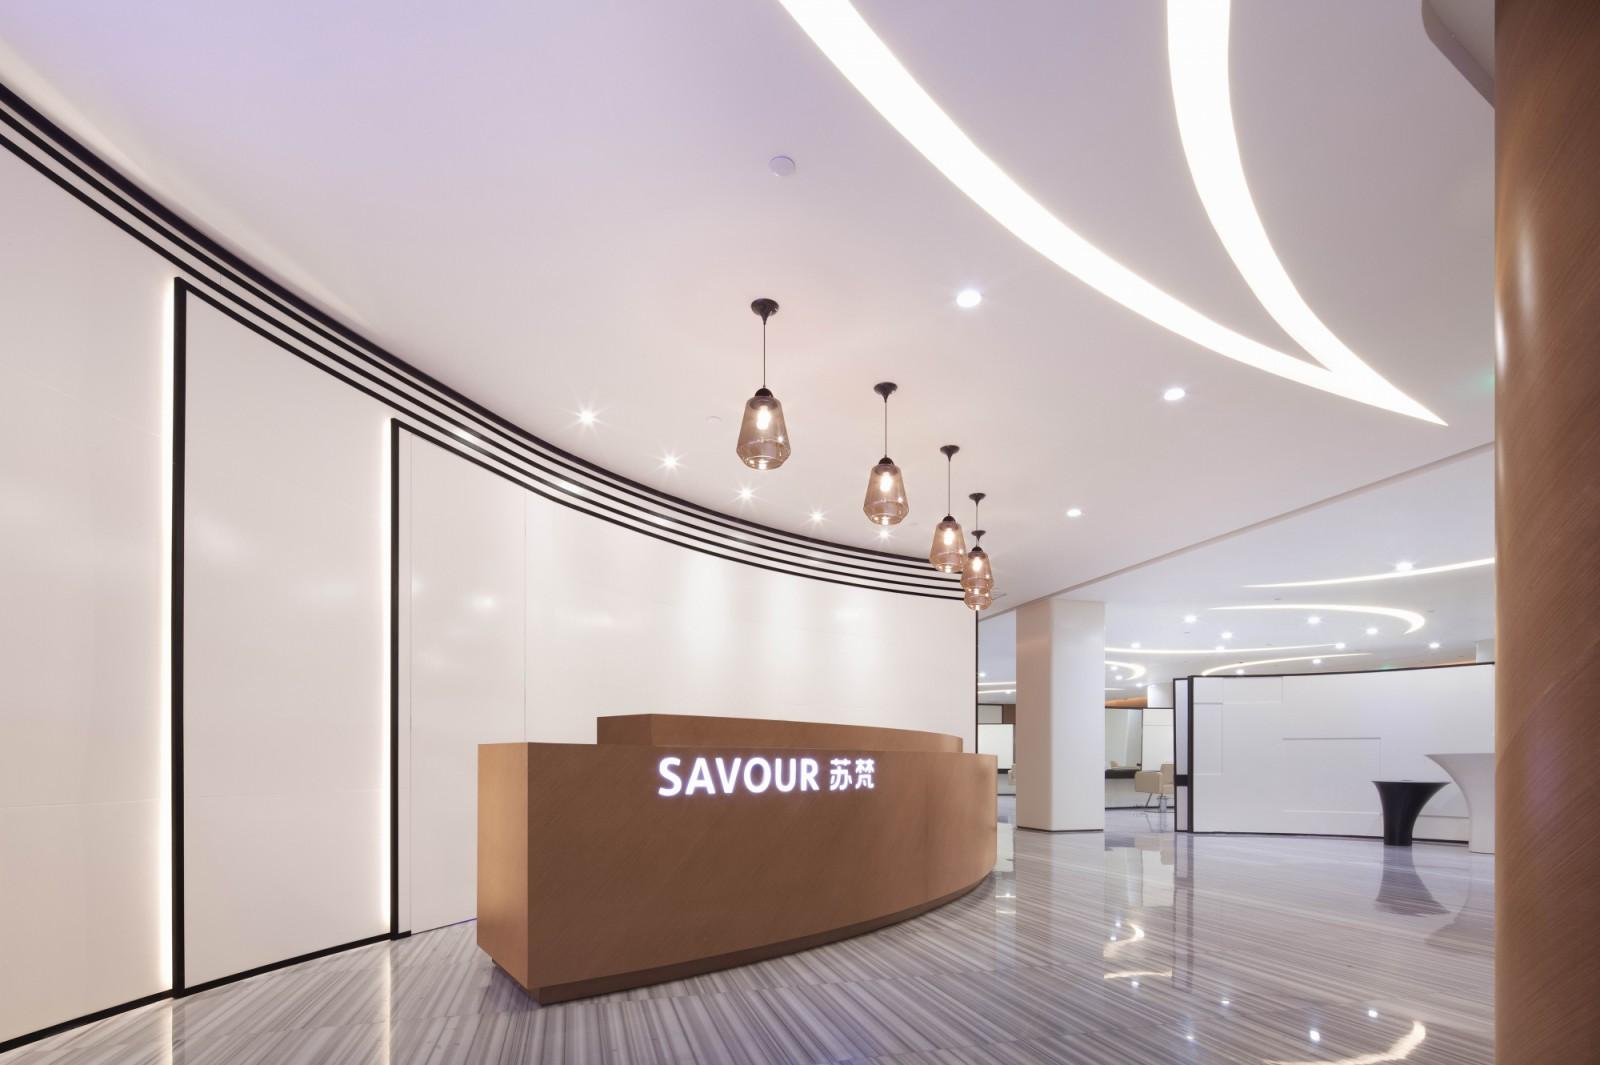 Savour Barber's Shop